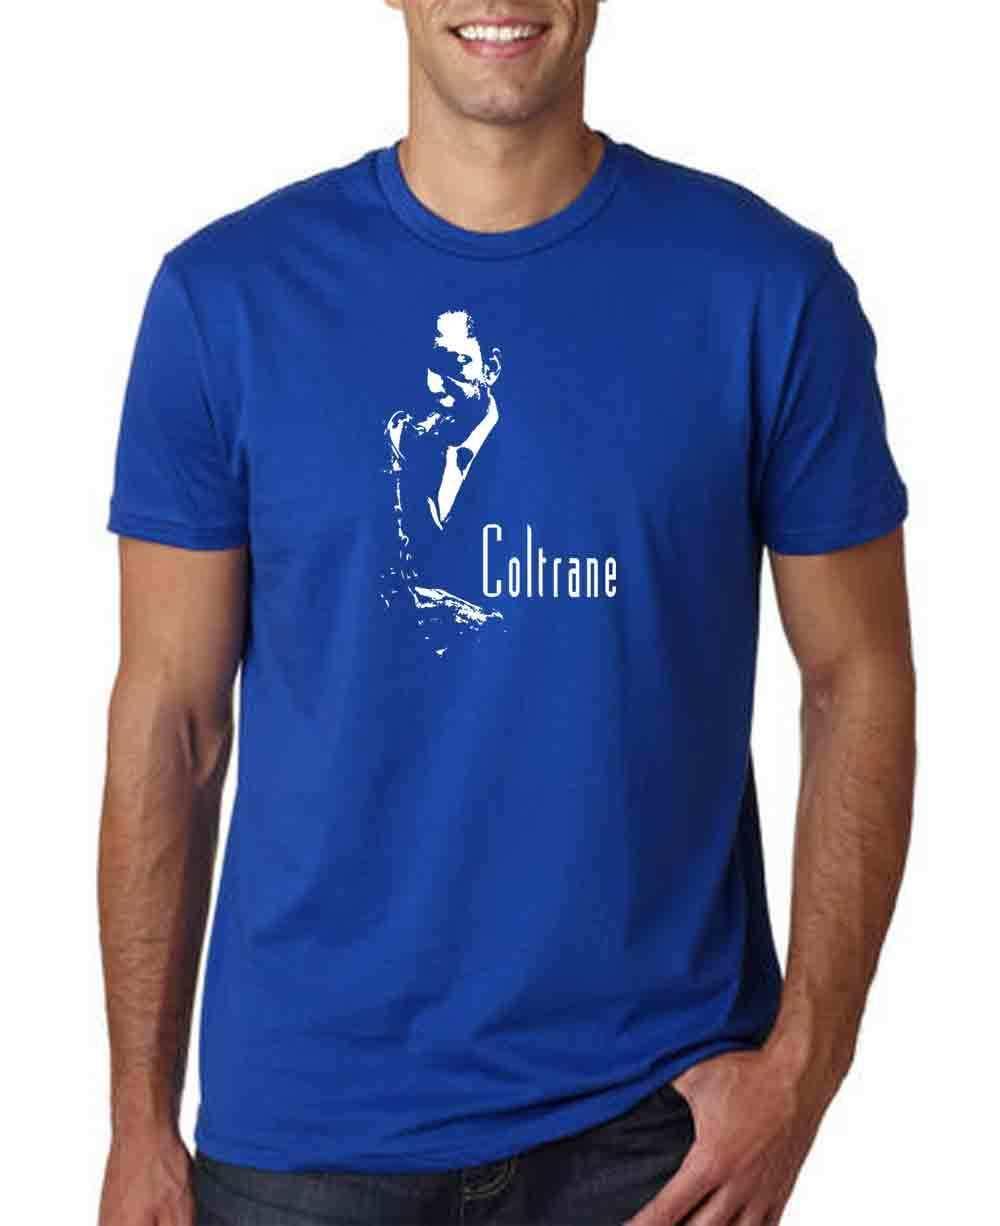 5b4420ba2 JOHN COLTRANE JAZZ ROYAL BLUE MEN T SHIRT MUSIC SAX BEBOP BLUES SAXOPHONE  MILES Funny Unisex Casual T Shirts Designer Funny Tee Shirt From  Clothing_dealss, ...